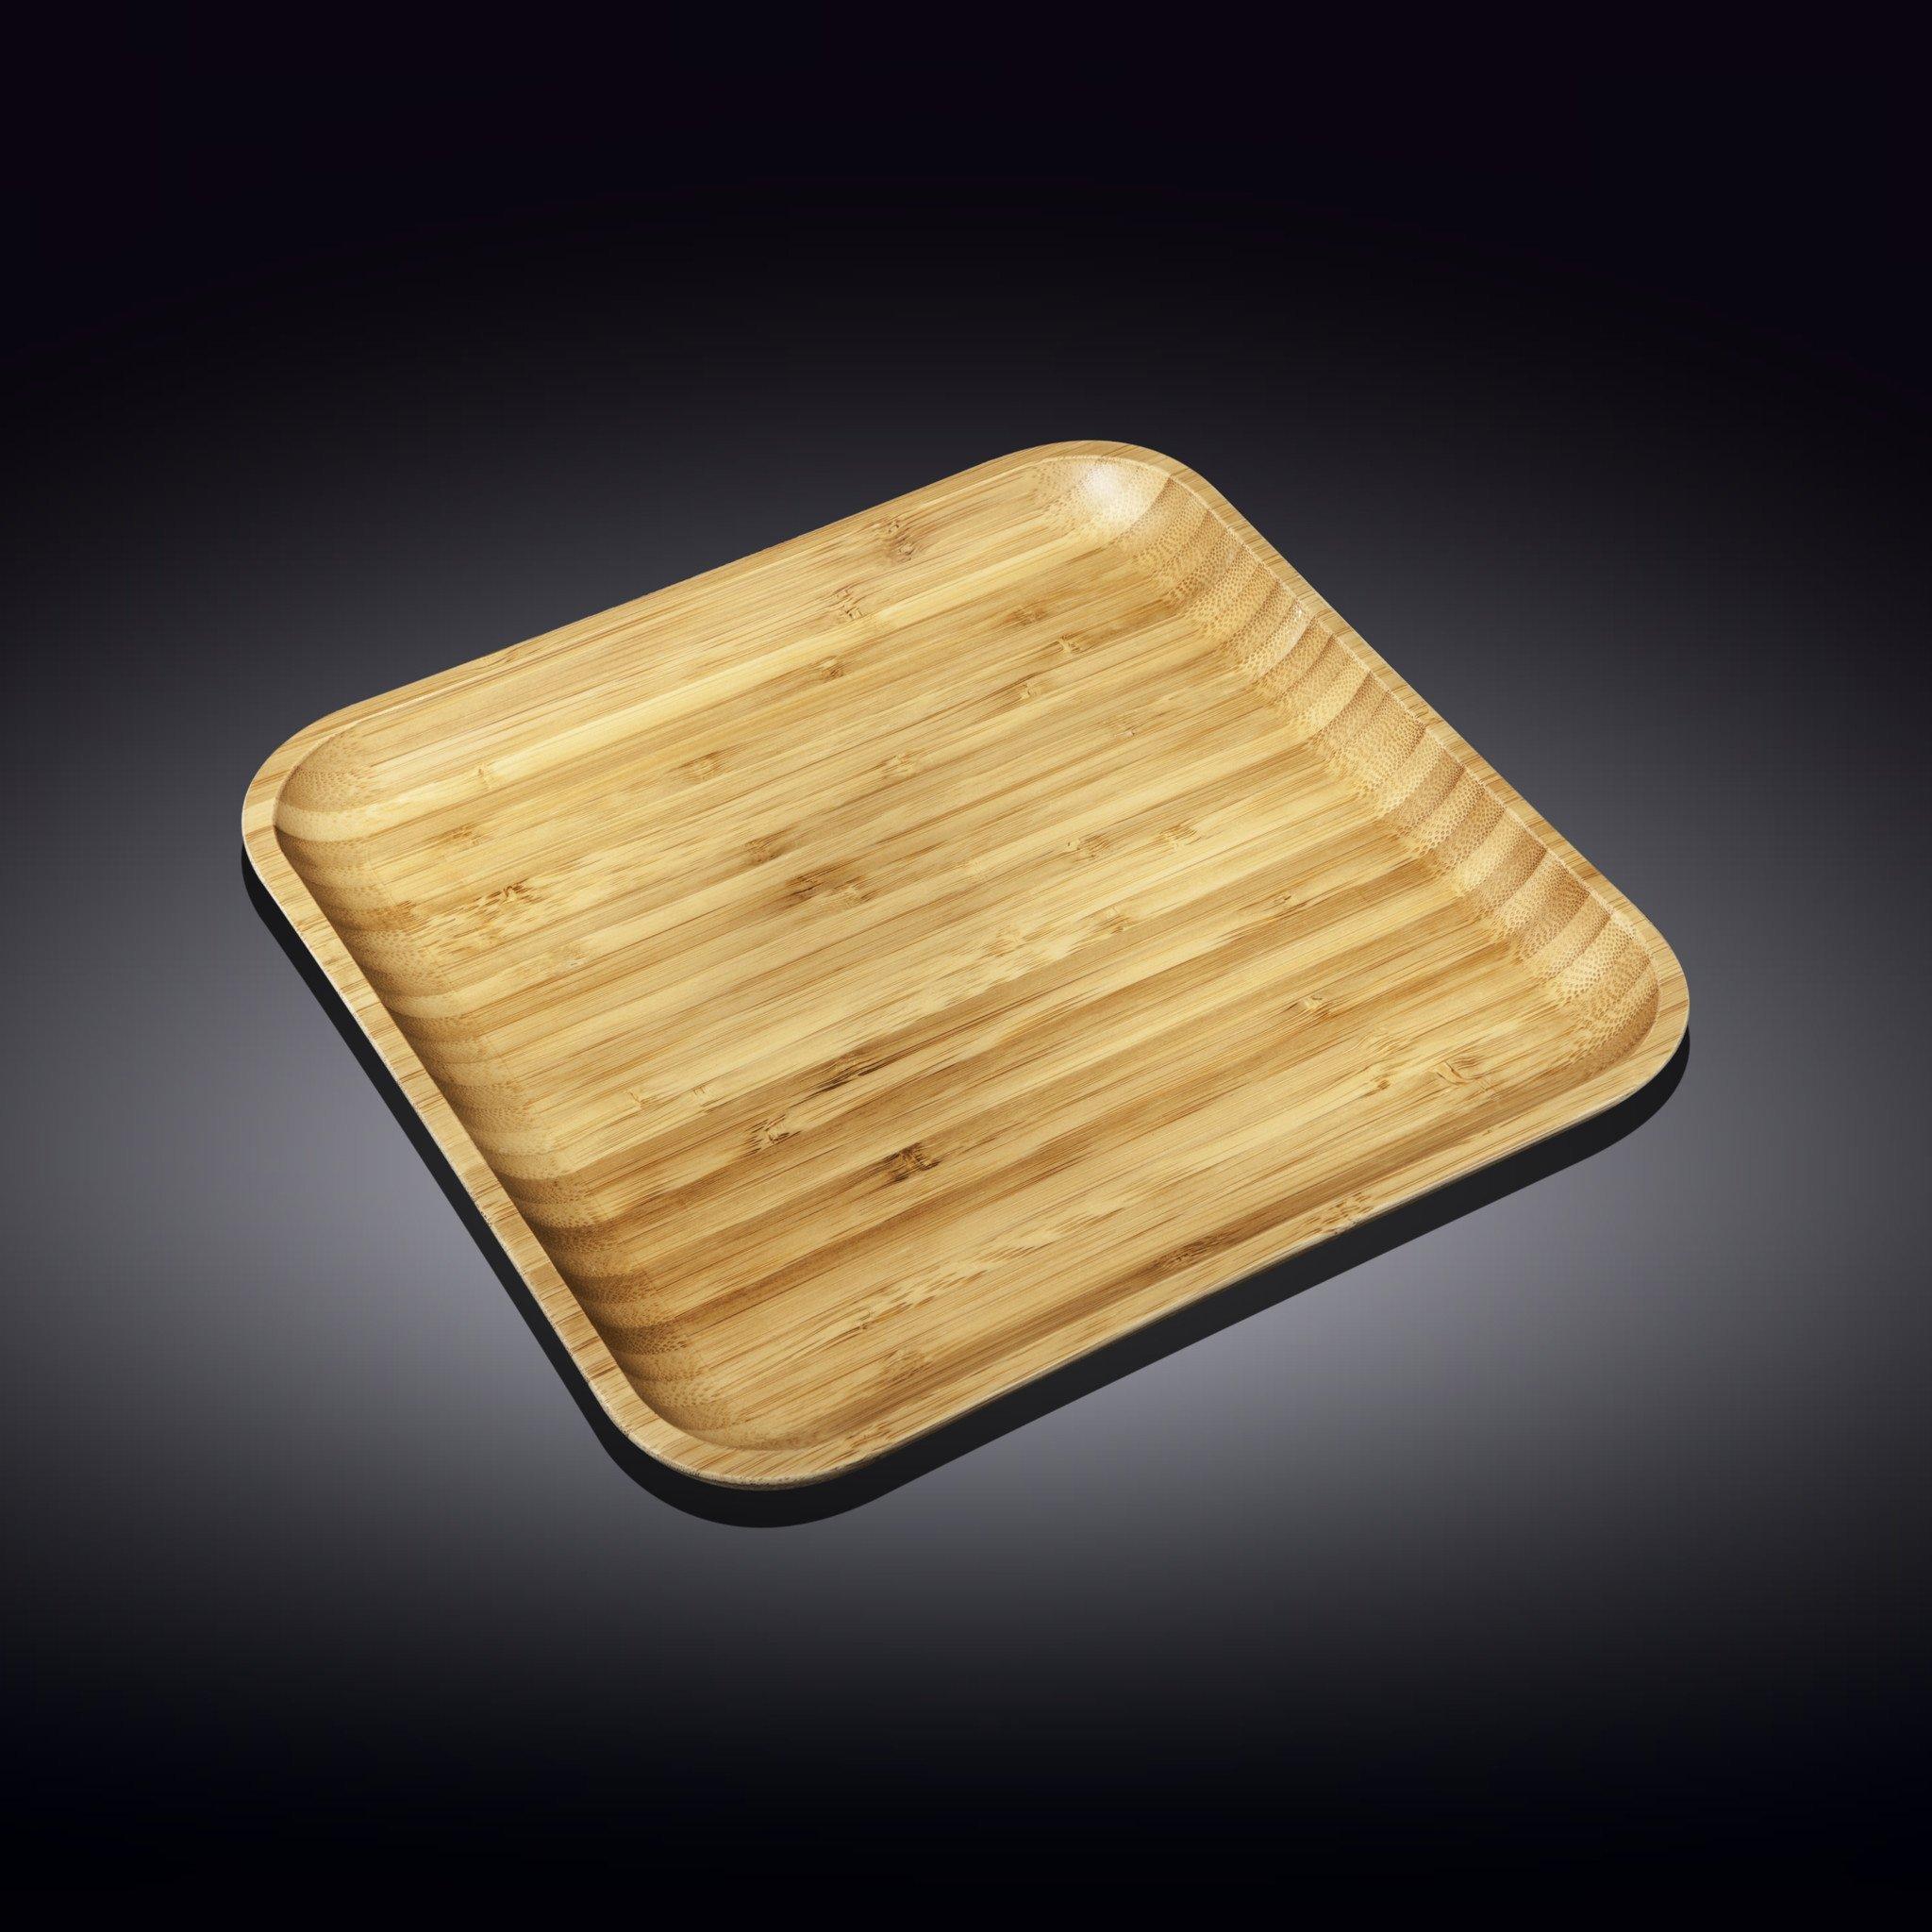 Тарелка бамбуковая Wilmax сервировочная квадратная 30,5x 30,5 см